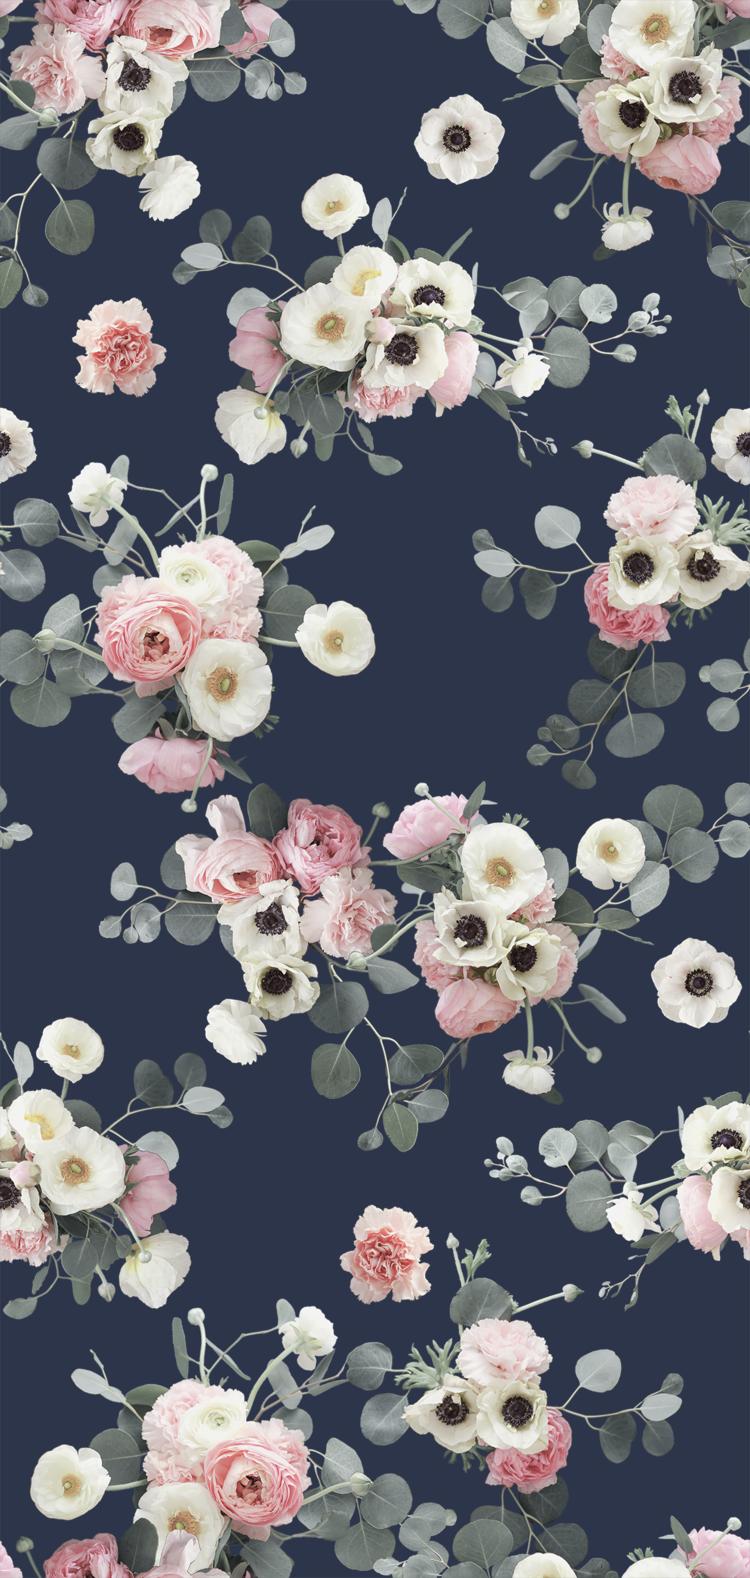 Fluffy Florals_TILE_FINAL_NAVY_copy.png